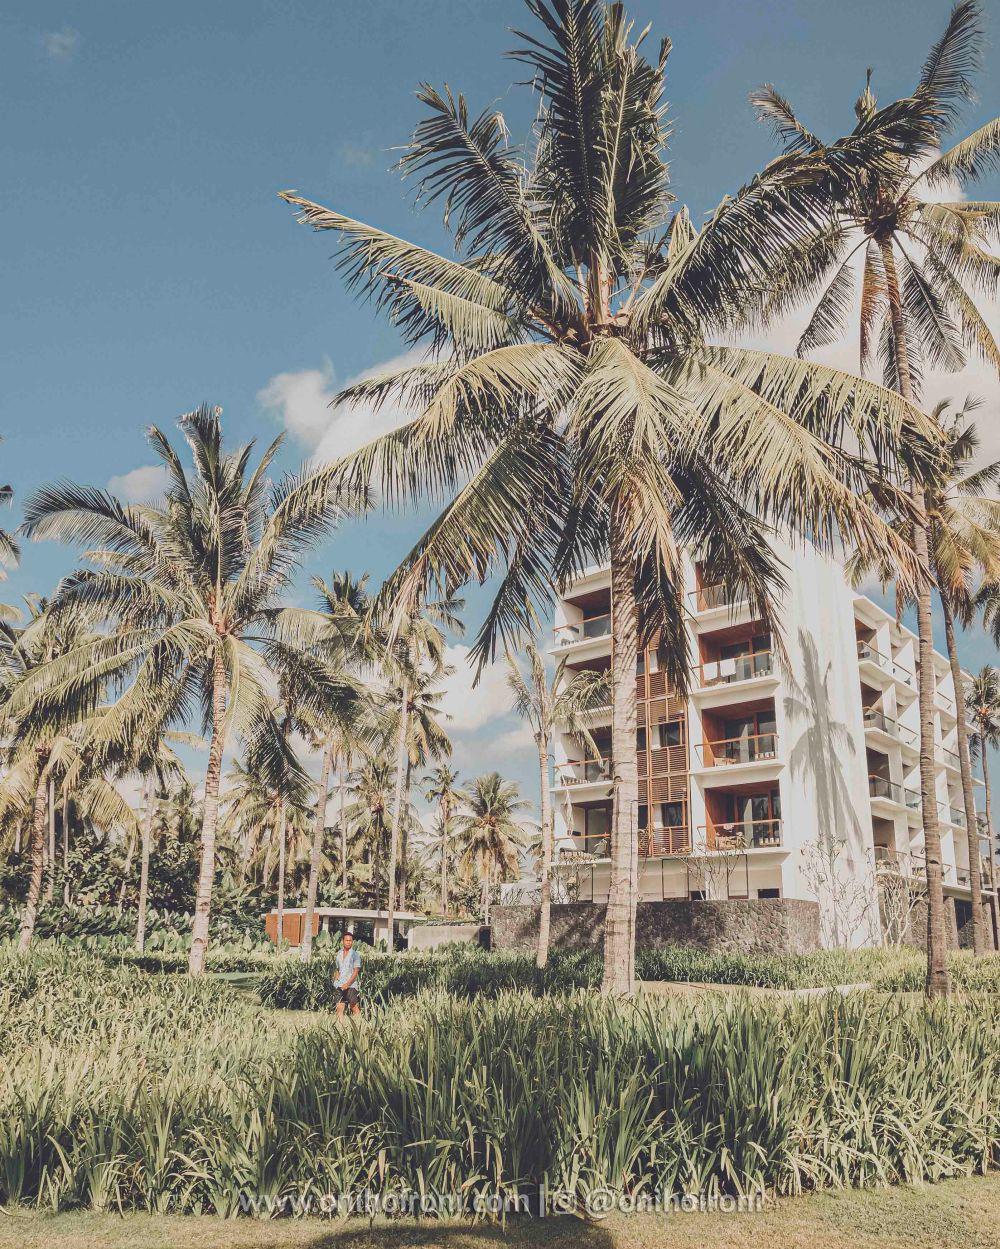 2 Spot instagramable Review Hotel Dialoog Banyuwangi oni hoironi